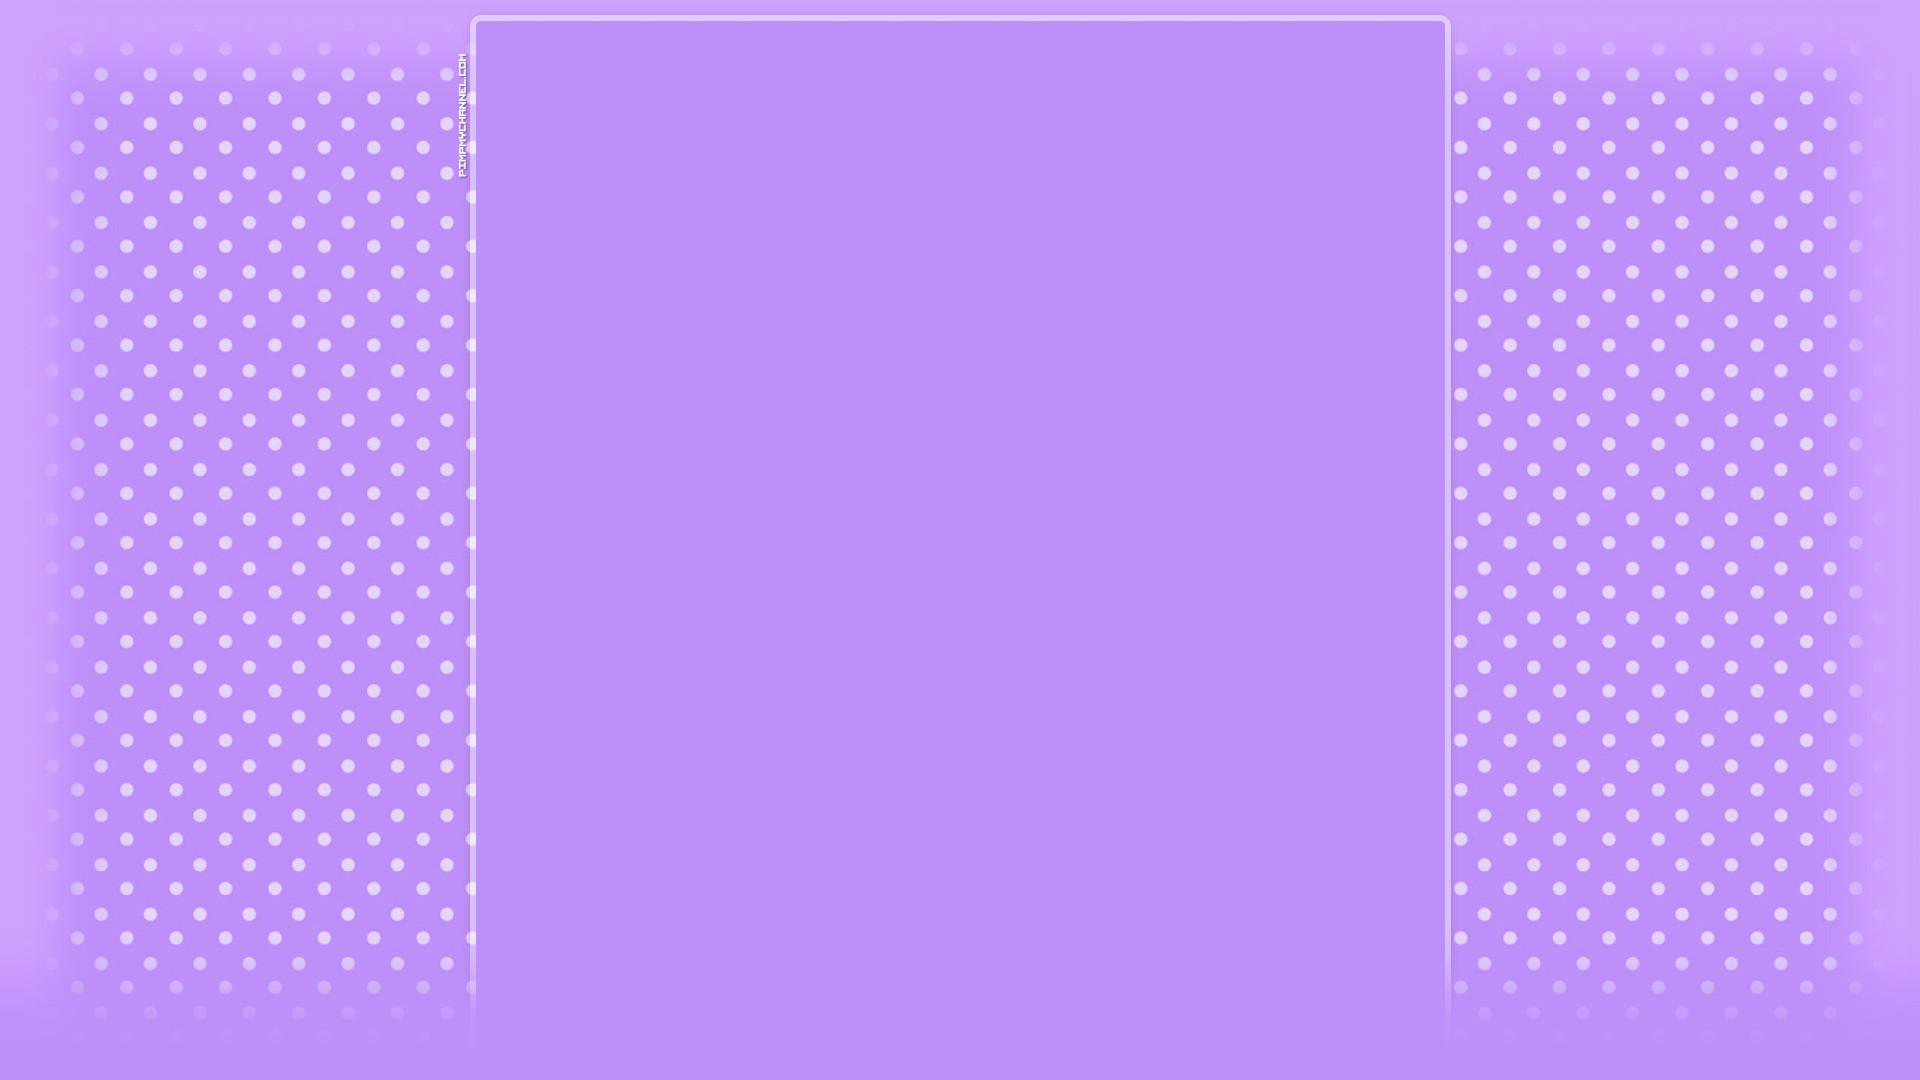 Purple Polka Dot Wallpaper Backgrounds – HD Wallpaperia